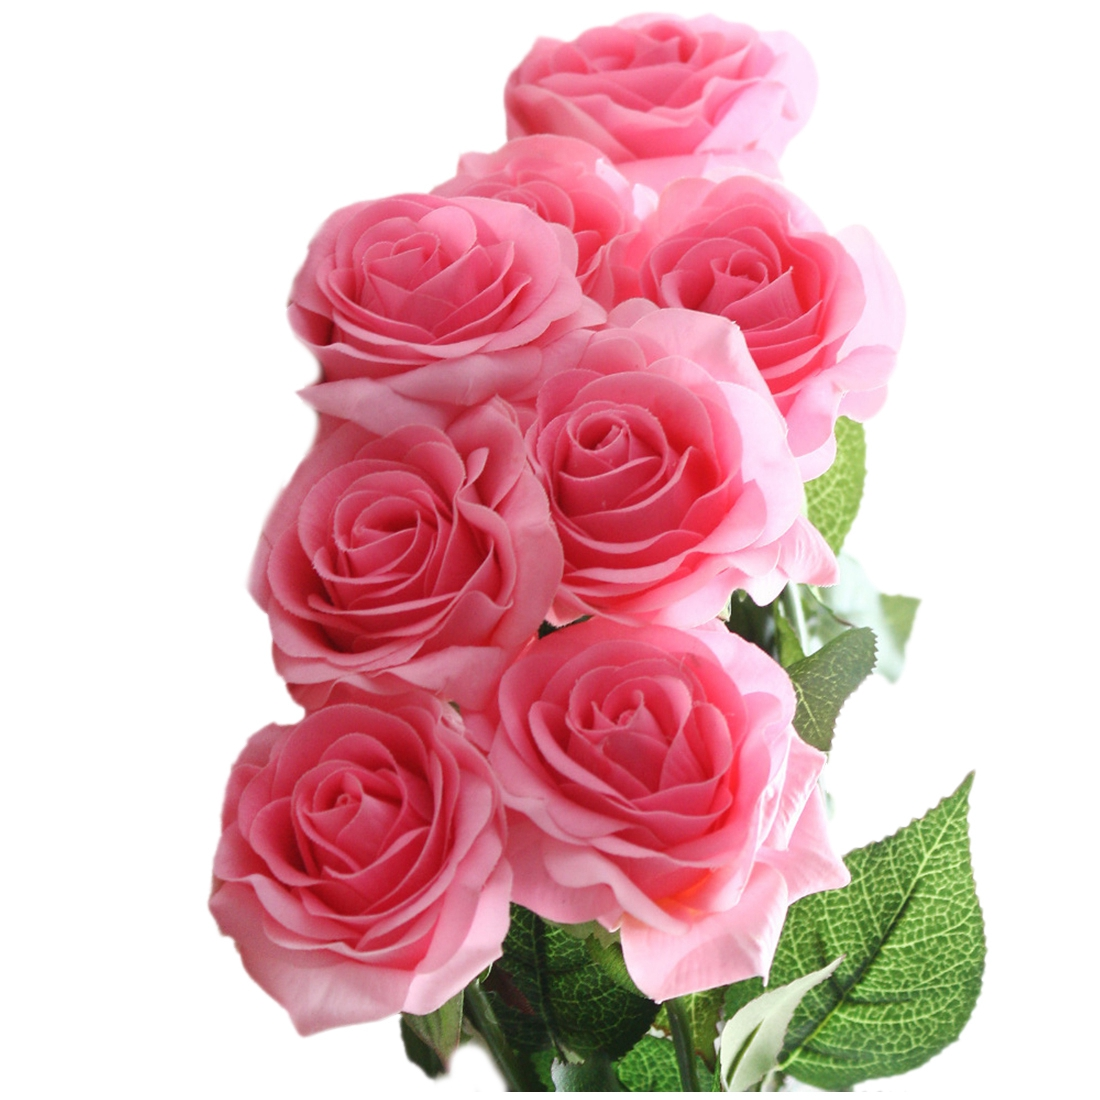 10 unids Latex Real Touch Rose Decoración Rosa Flores Artificiales Flores de Sed